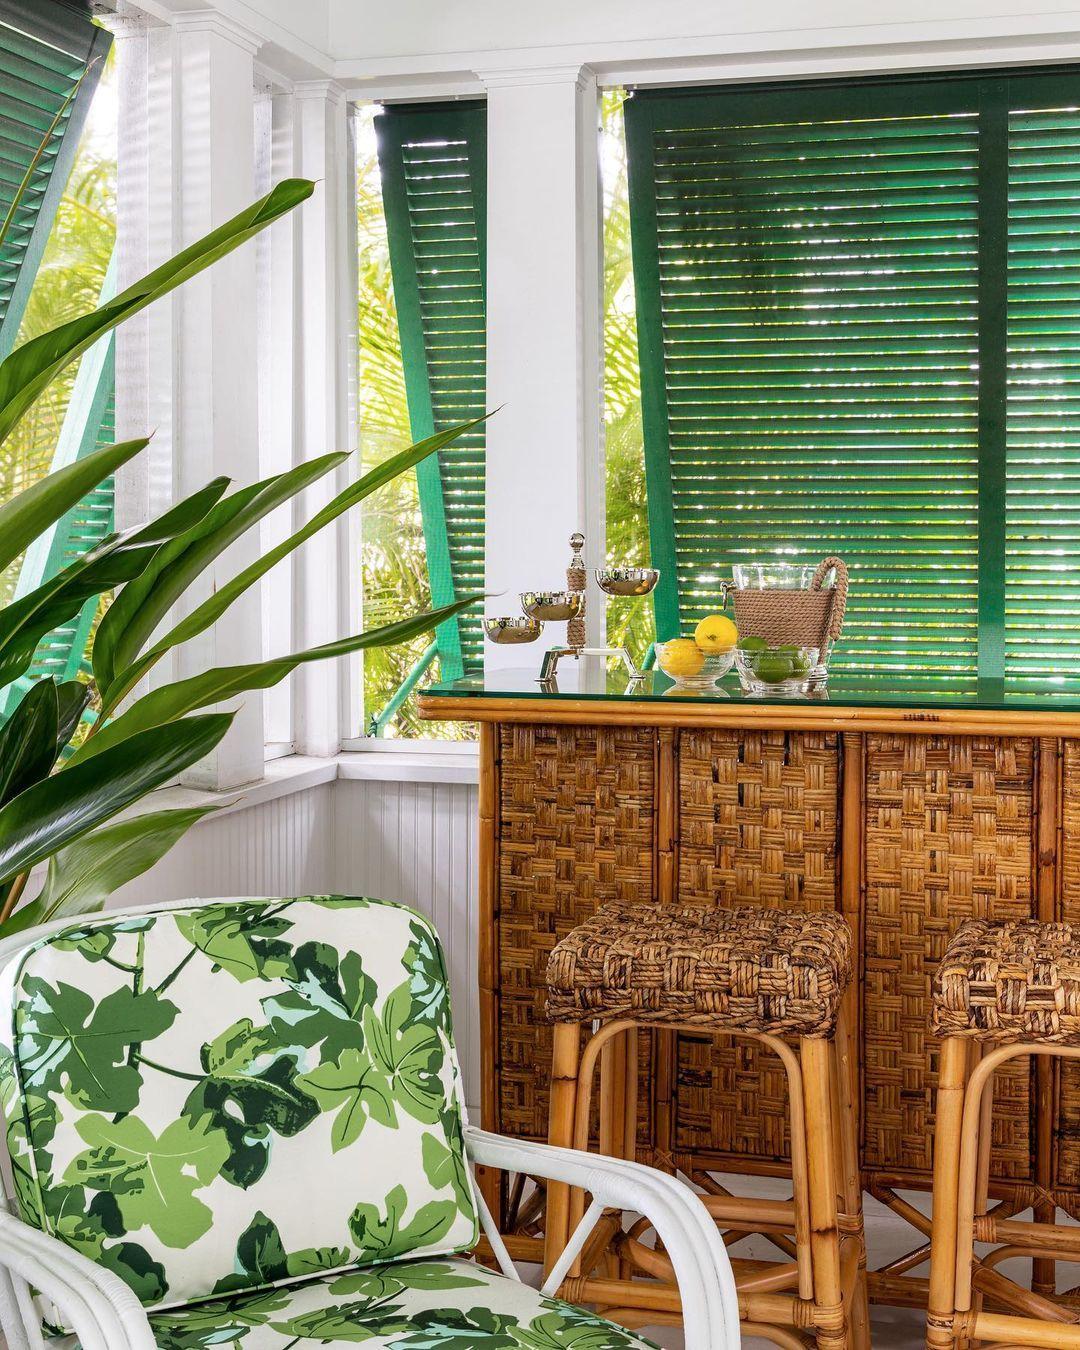 "McCann Design Group on Instagram: ""Happy hour tropical-style on a vintage banana leaf bar. #artdirectorscottage . . #mccanndesigngroup #vintage #westpalmbeach #palmbeach…"""